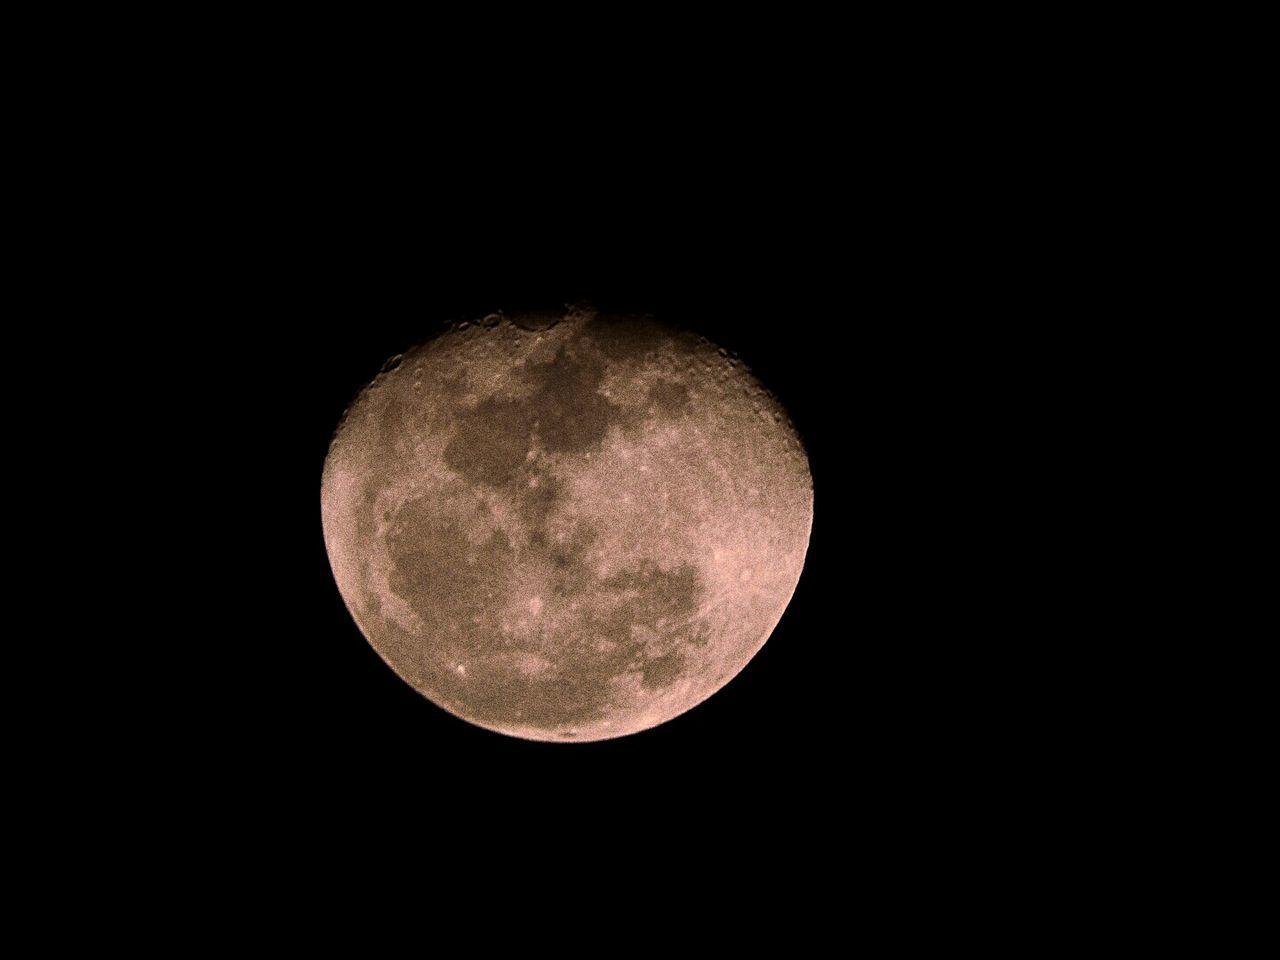 Hanging Out Moonlight Skyscape Nikonp610 Zoomeffect Moonlightscape Enjoying Life Secondeyeemphoto L4l Likeforlike L4f Likeforfollow Plzdofollow 60*